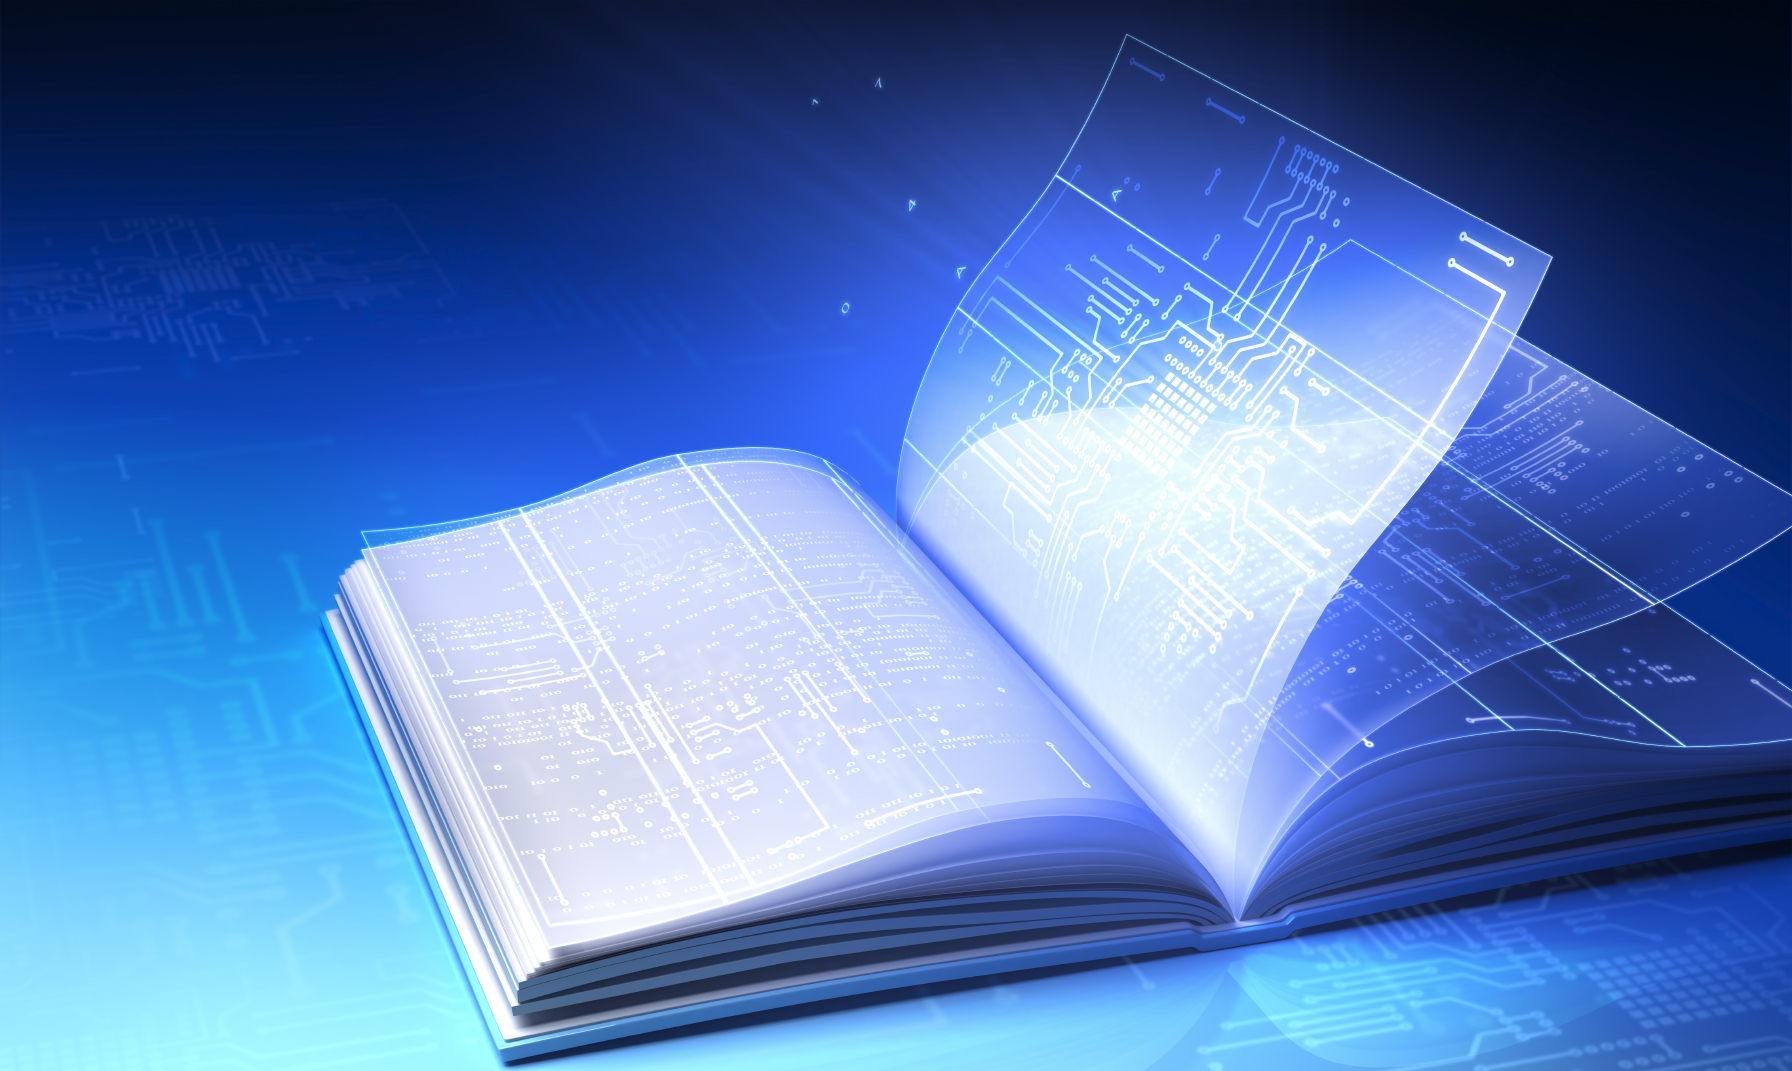 digital-book.jpg